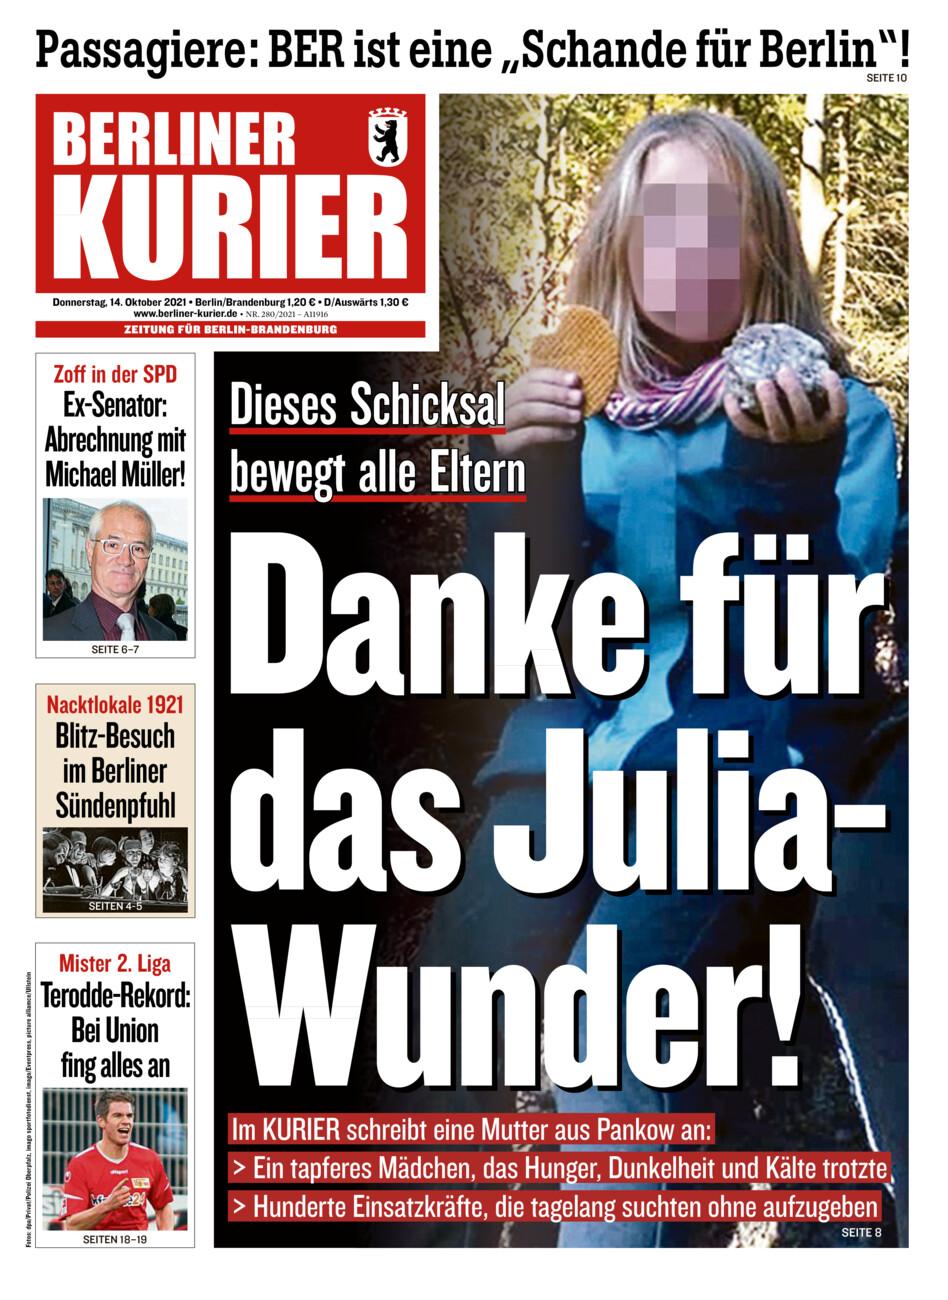 Berliner Kurier vom Donnerstag, 14.10.2021